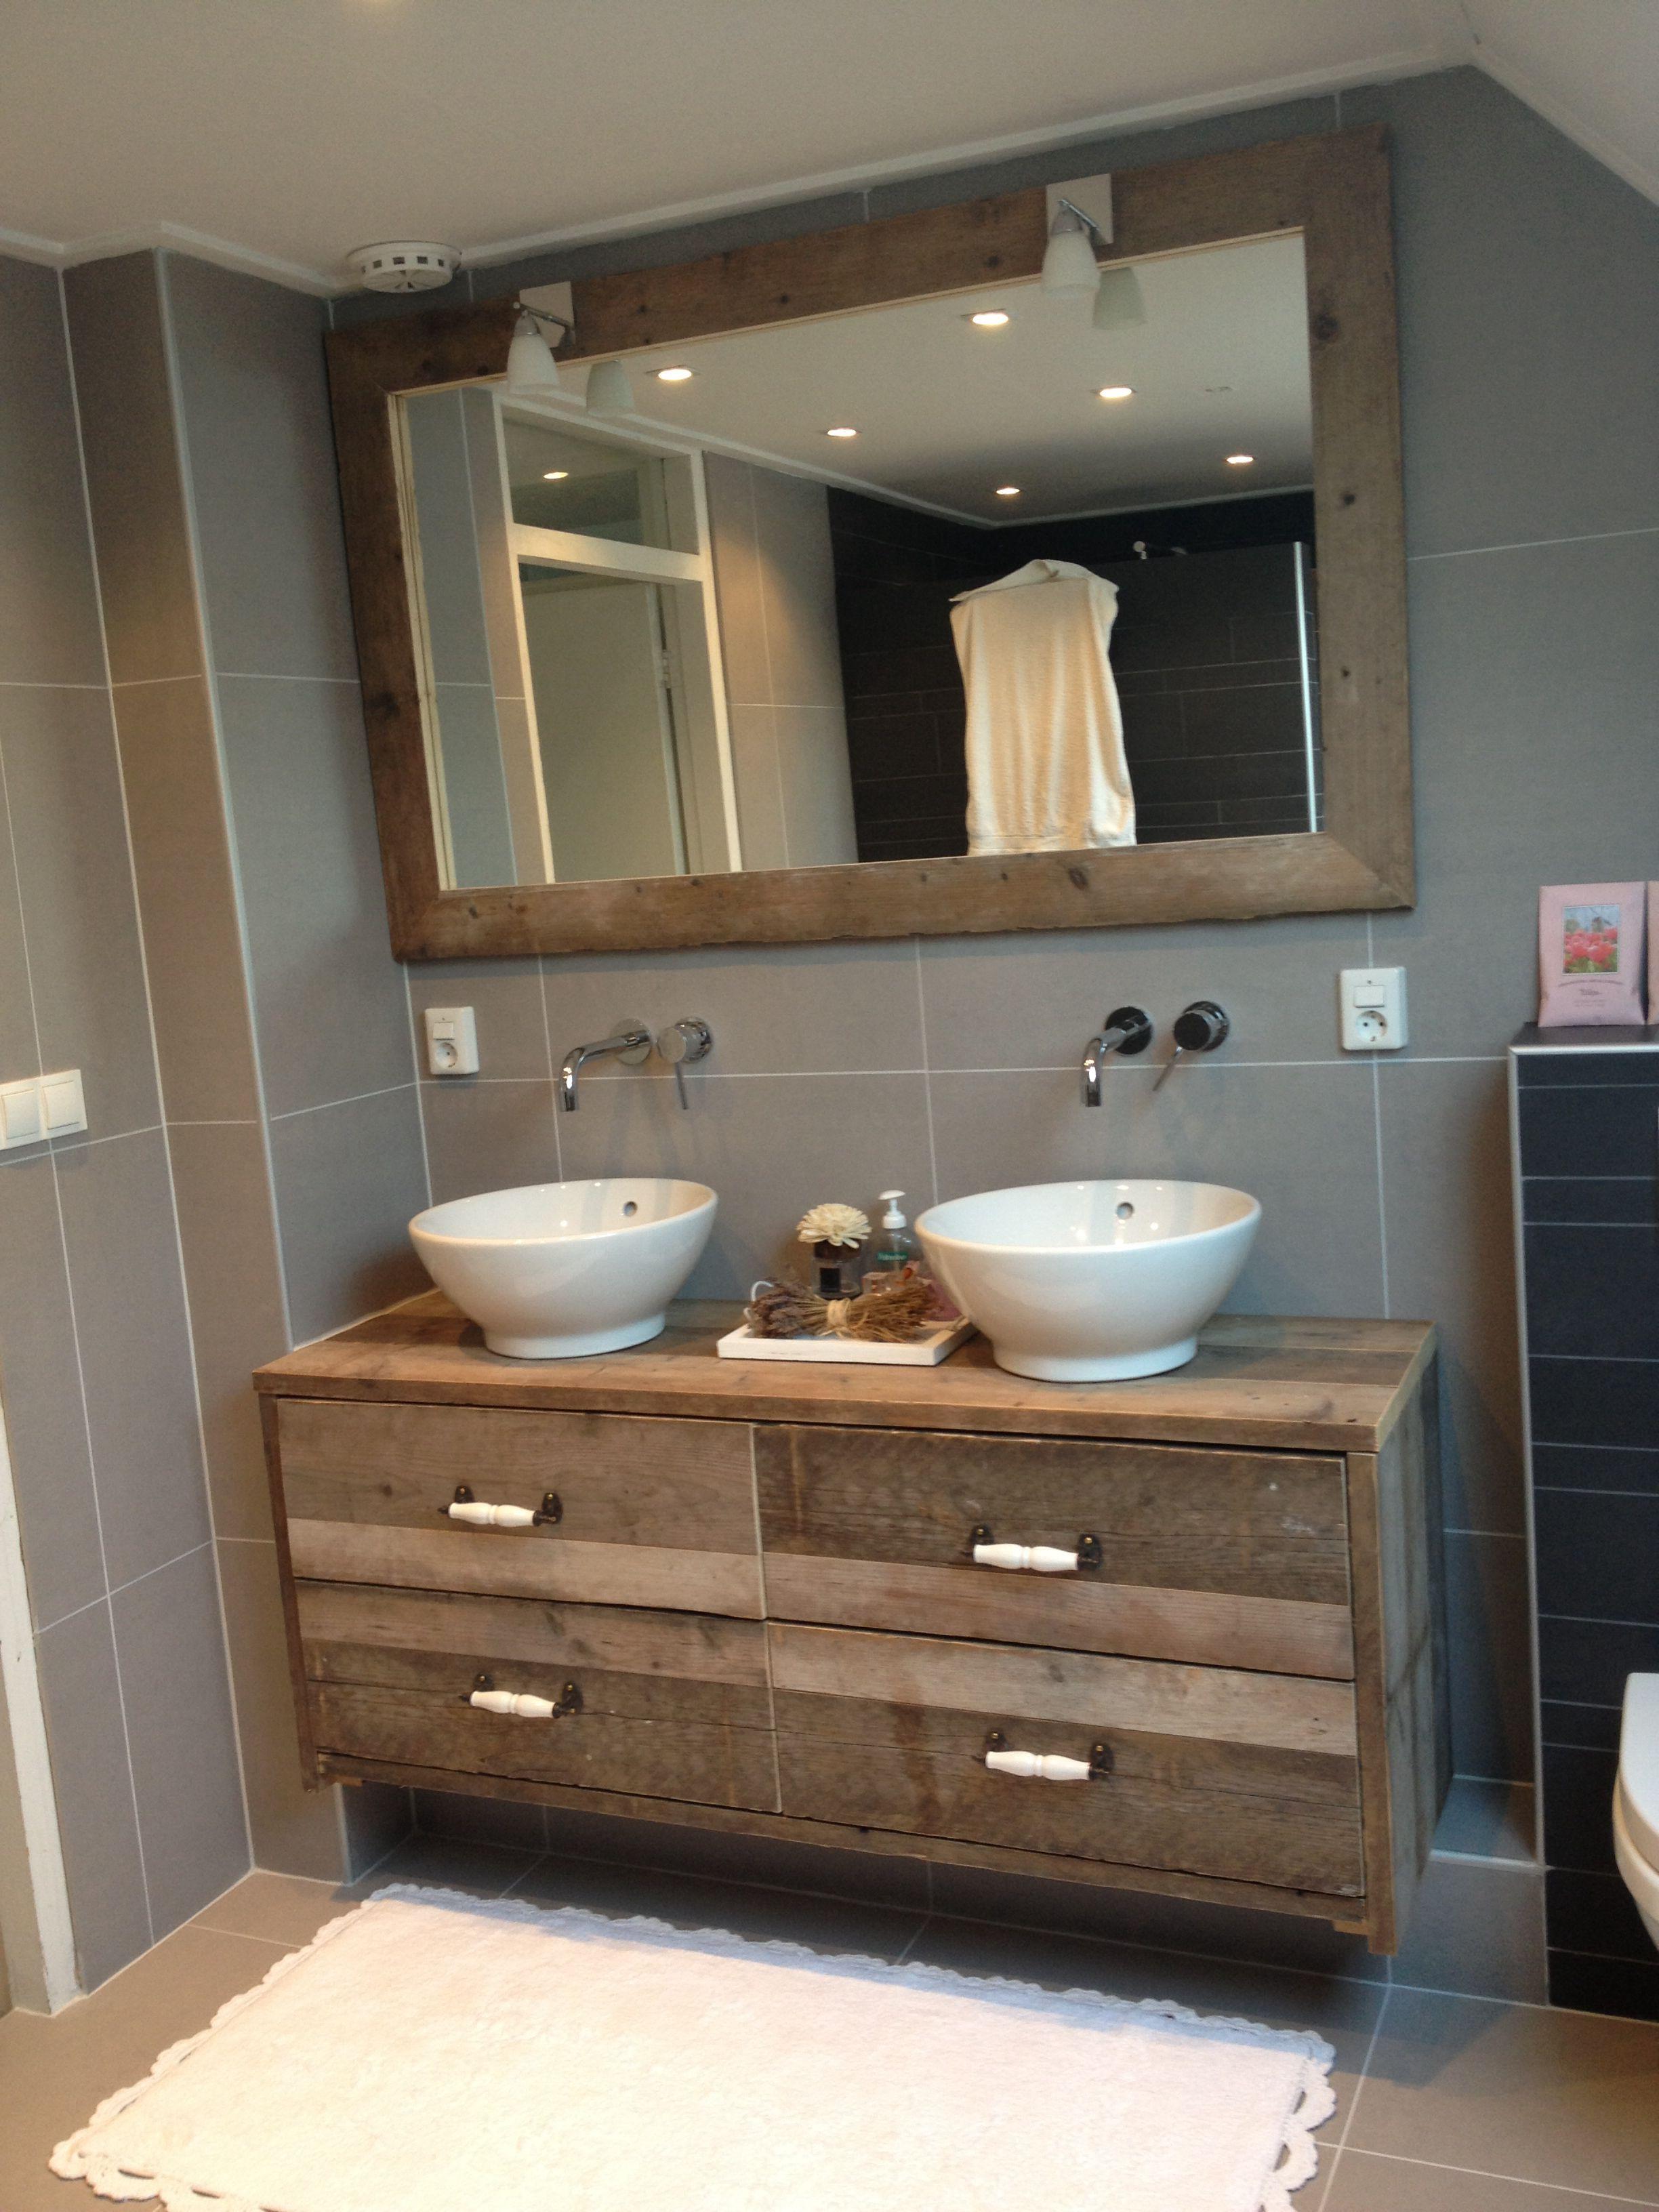 Badkamer Ideeen : Badmeubel van steigerhout! My home ️ badkamer ...